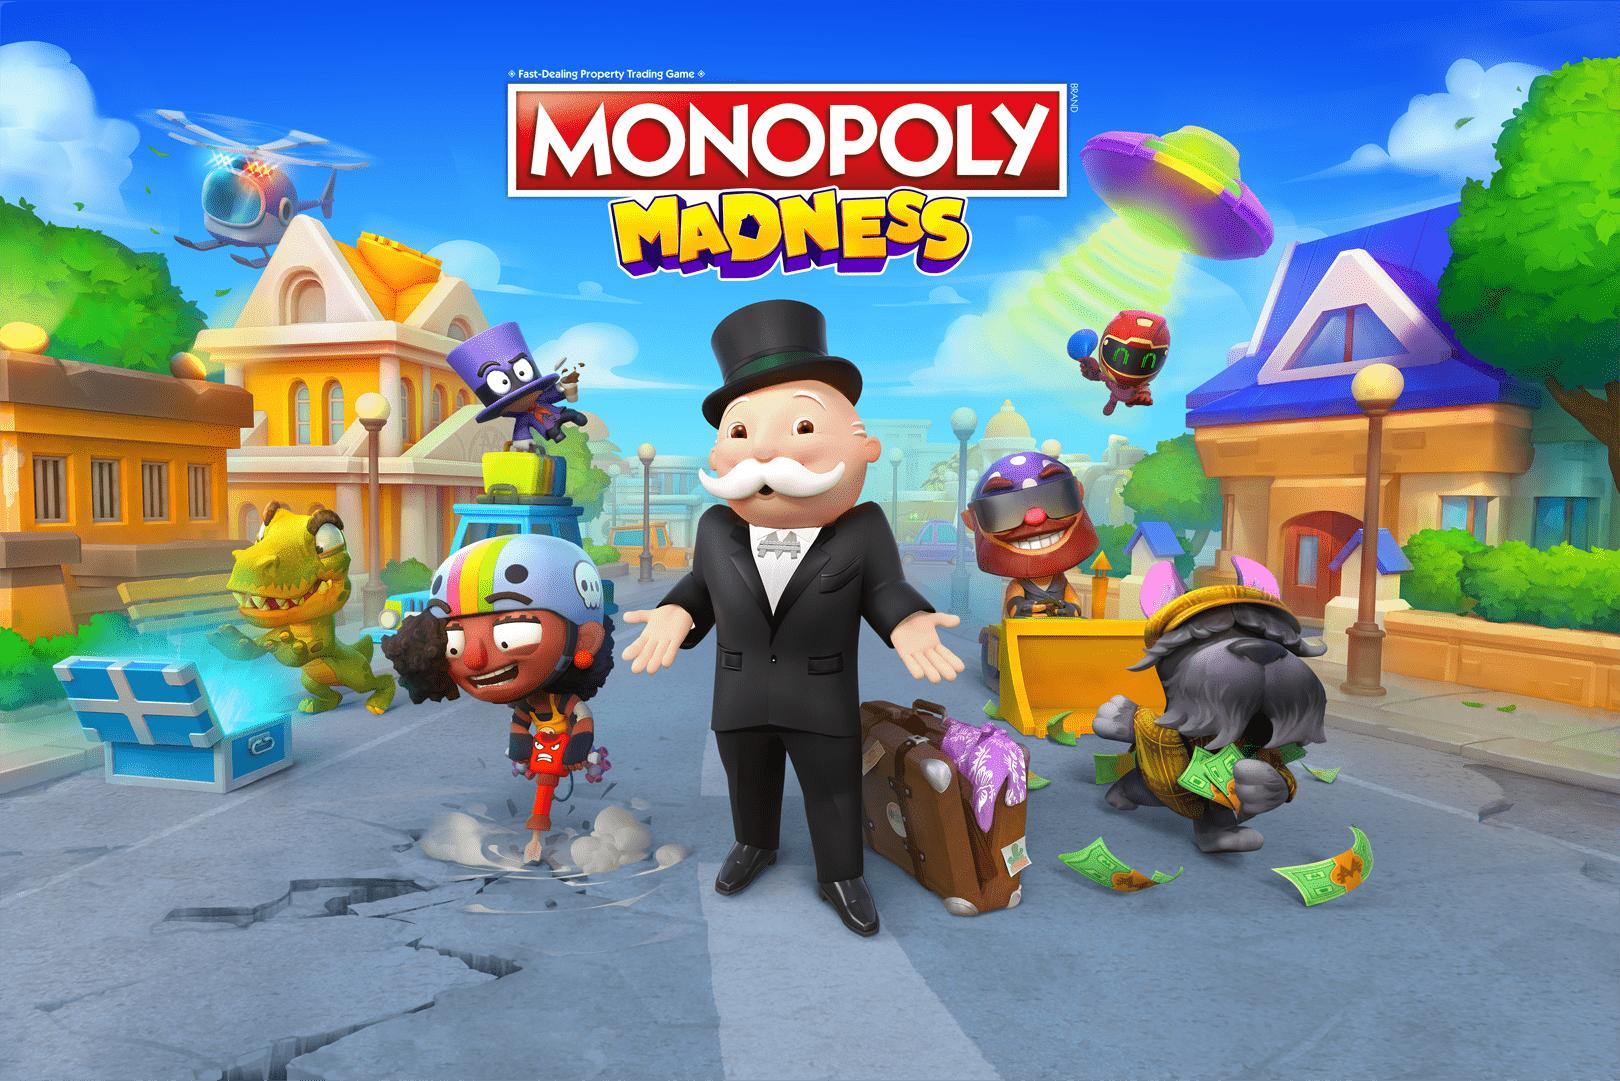 MONOPOLY Madness นำประสบการณ์การเล่นสุดคลาสสิกมาสู่รูปแบบเกมอารีน่า